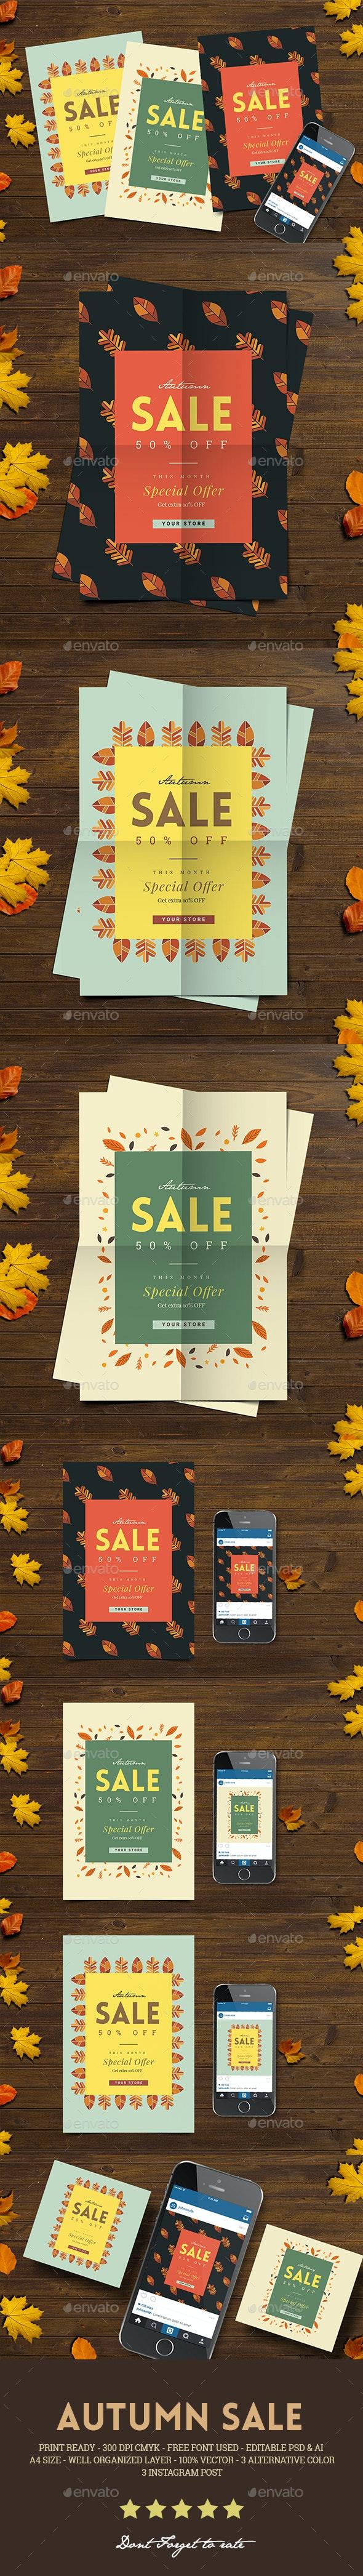 Autumn Sale Flyer + Instagram Post - Commerce Flyers